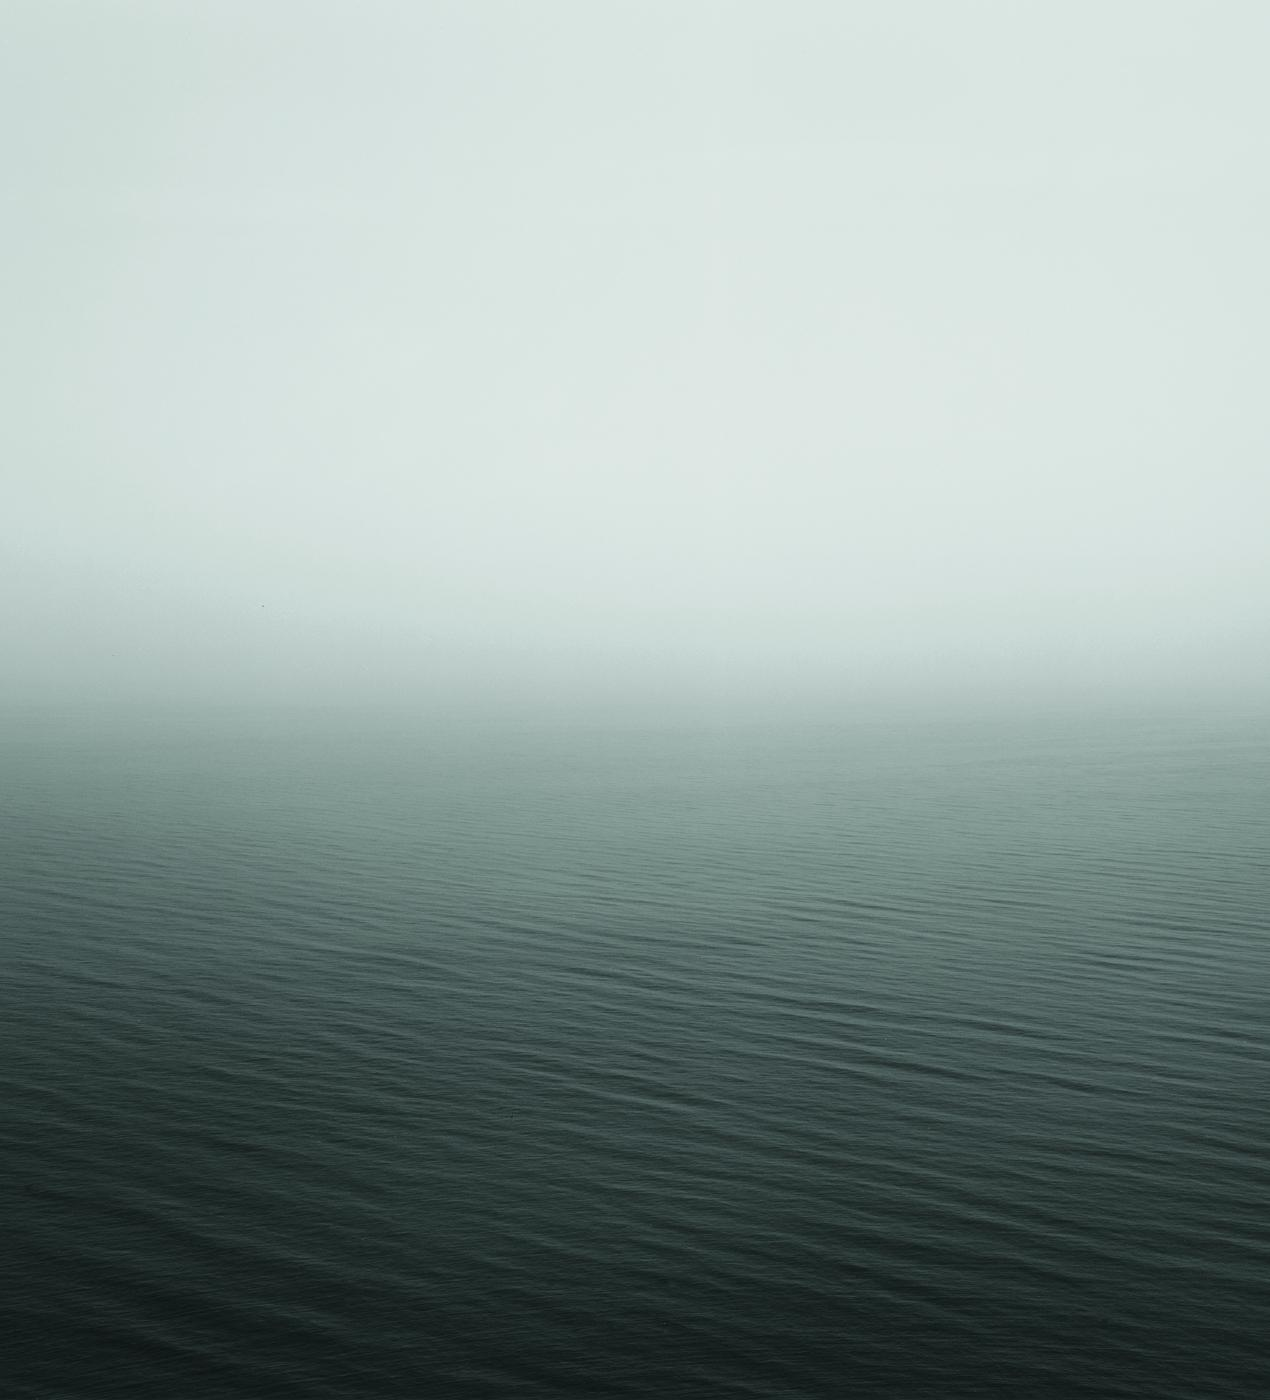 Hiroshi-Sugimoto-seascape